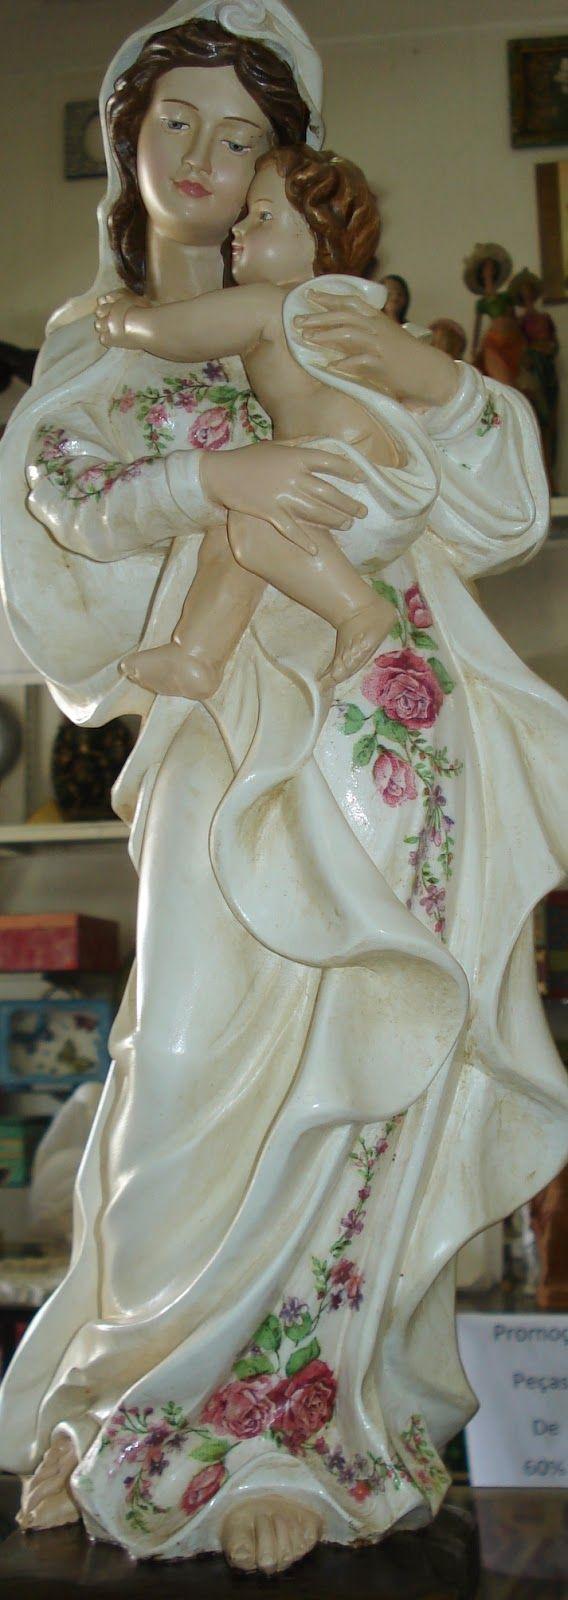 Fernanda Orsi - Pintura Decorativa: Peças Decorativas com Estamparia (Decoupage)